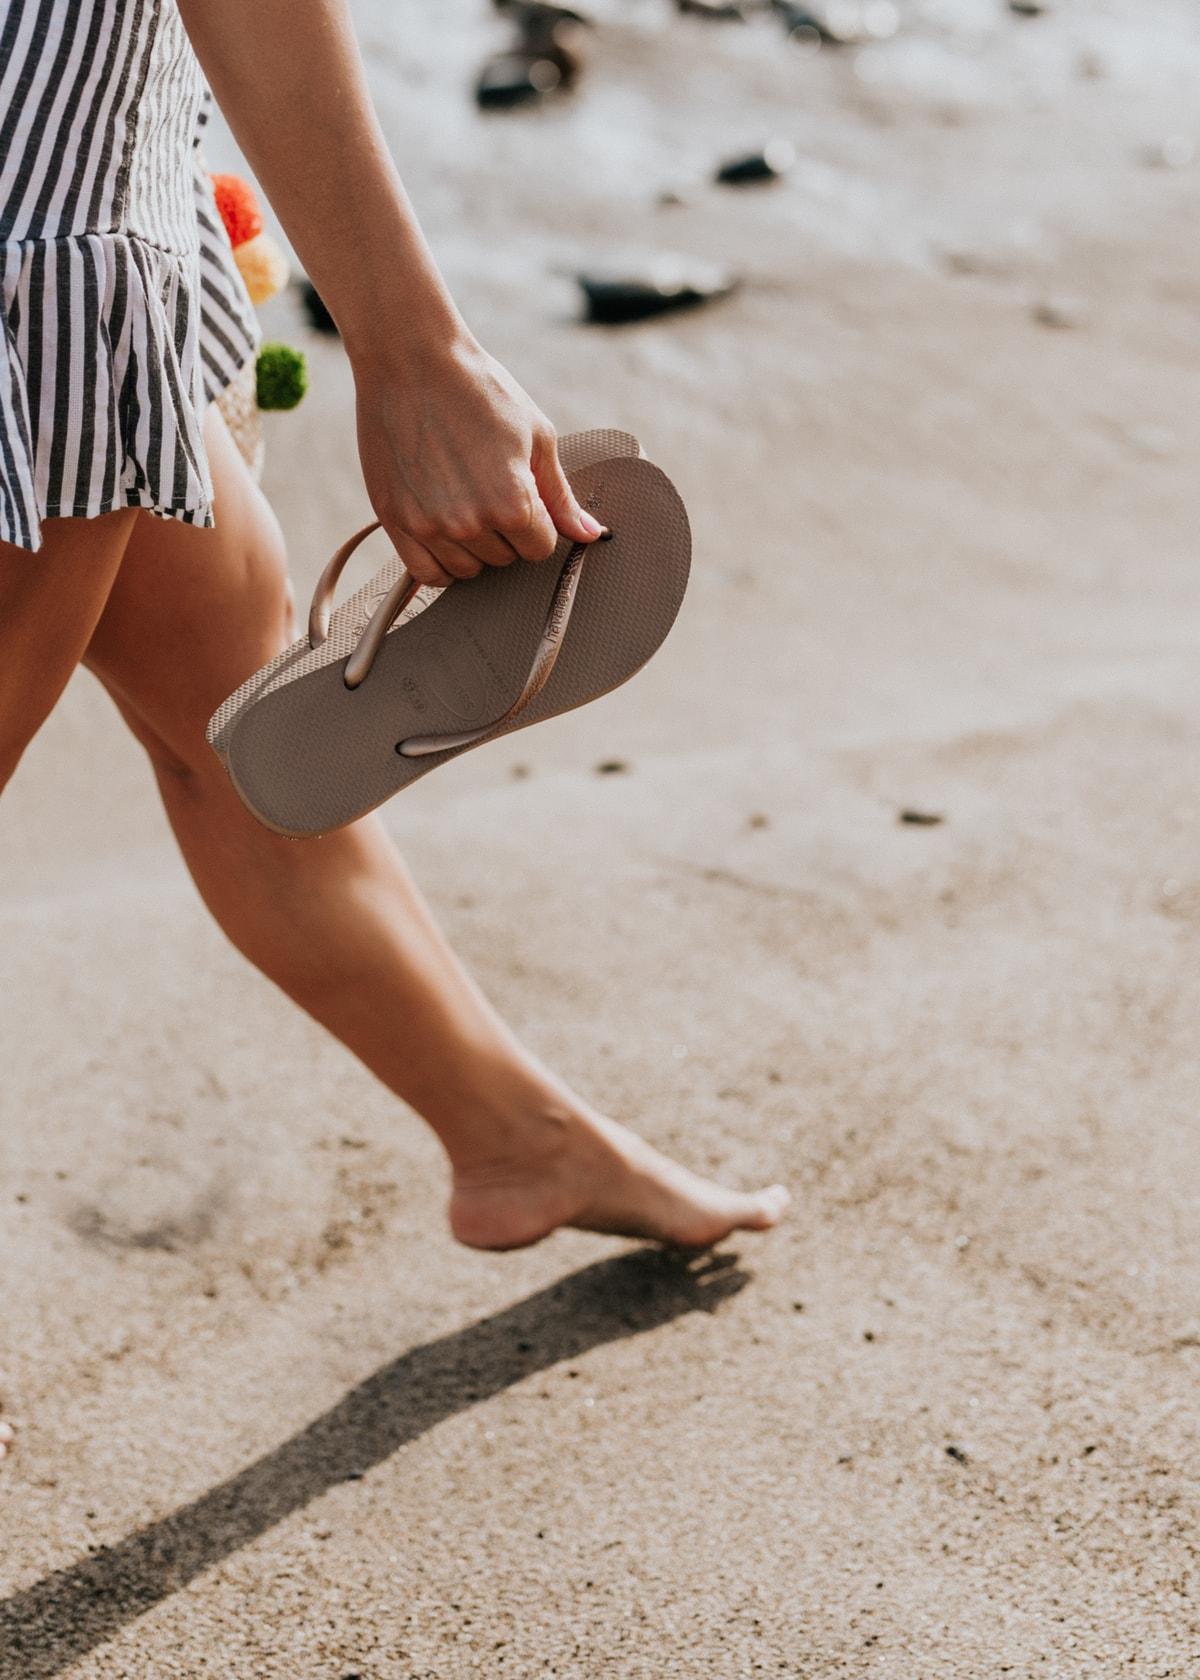 havaianas sandals nordstrom prime day